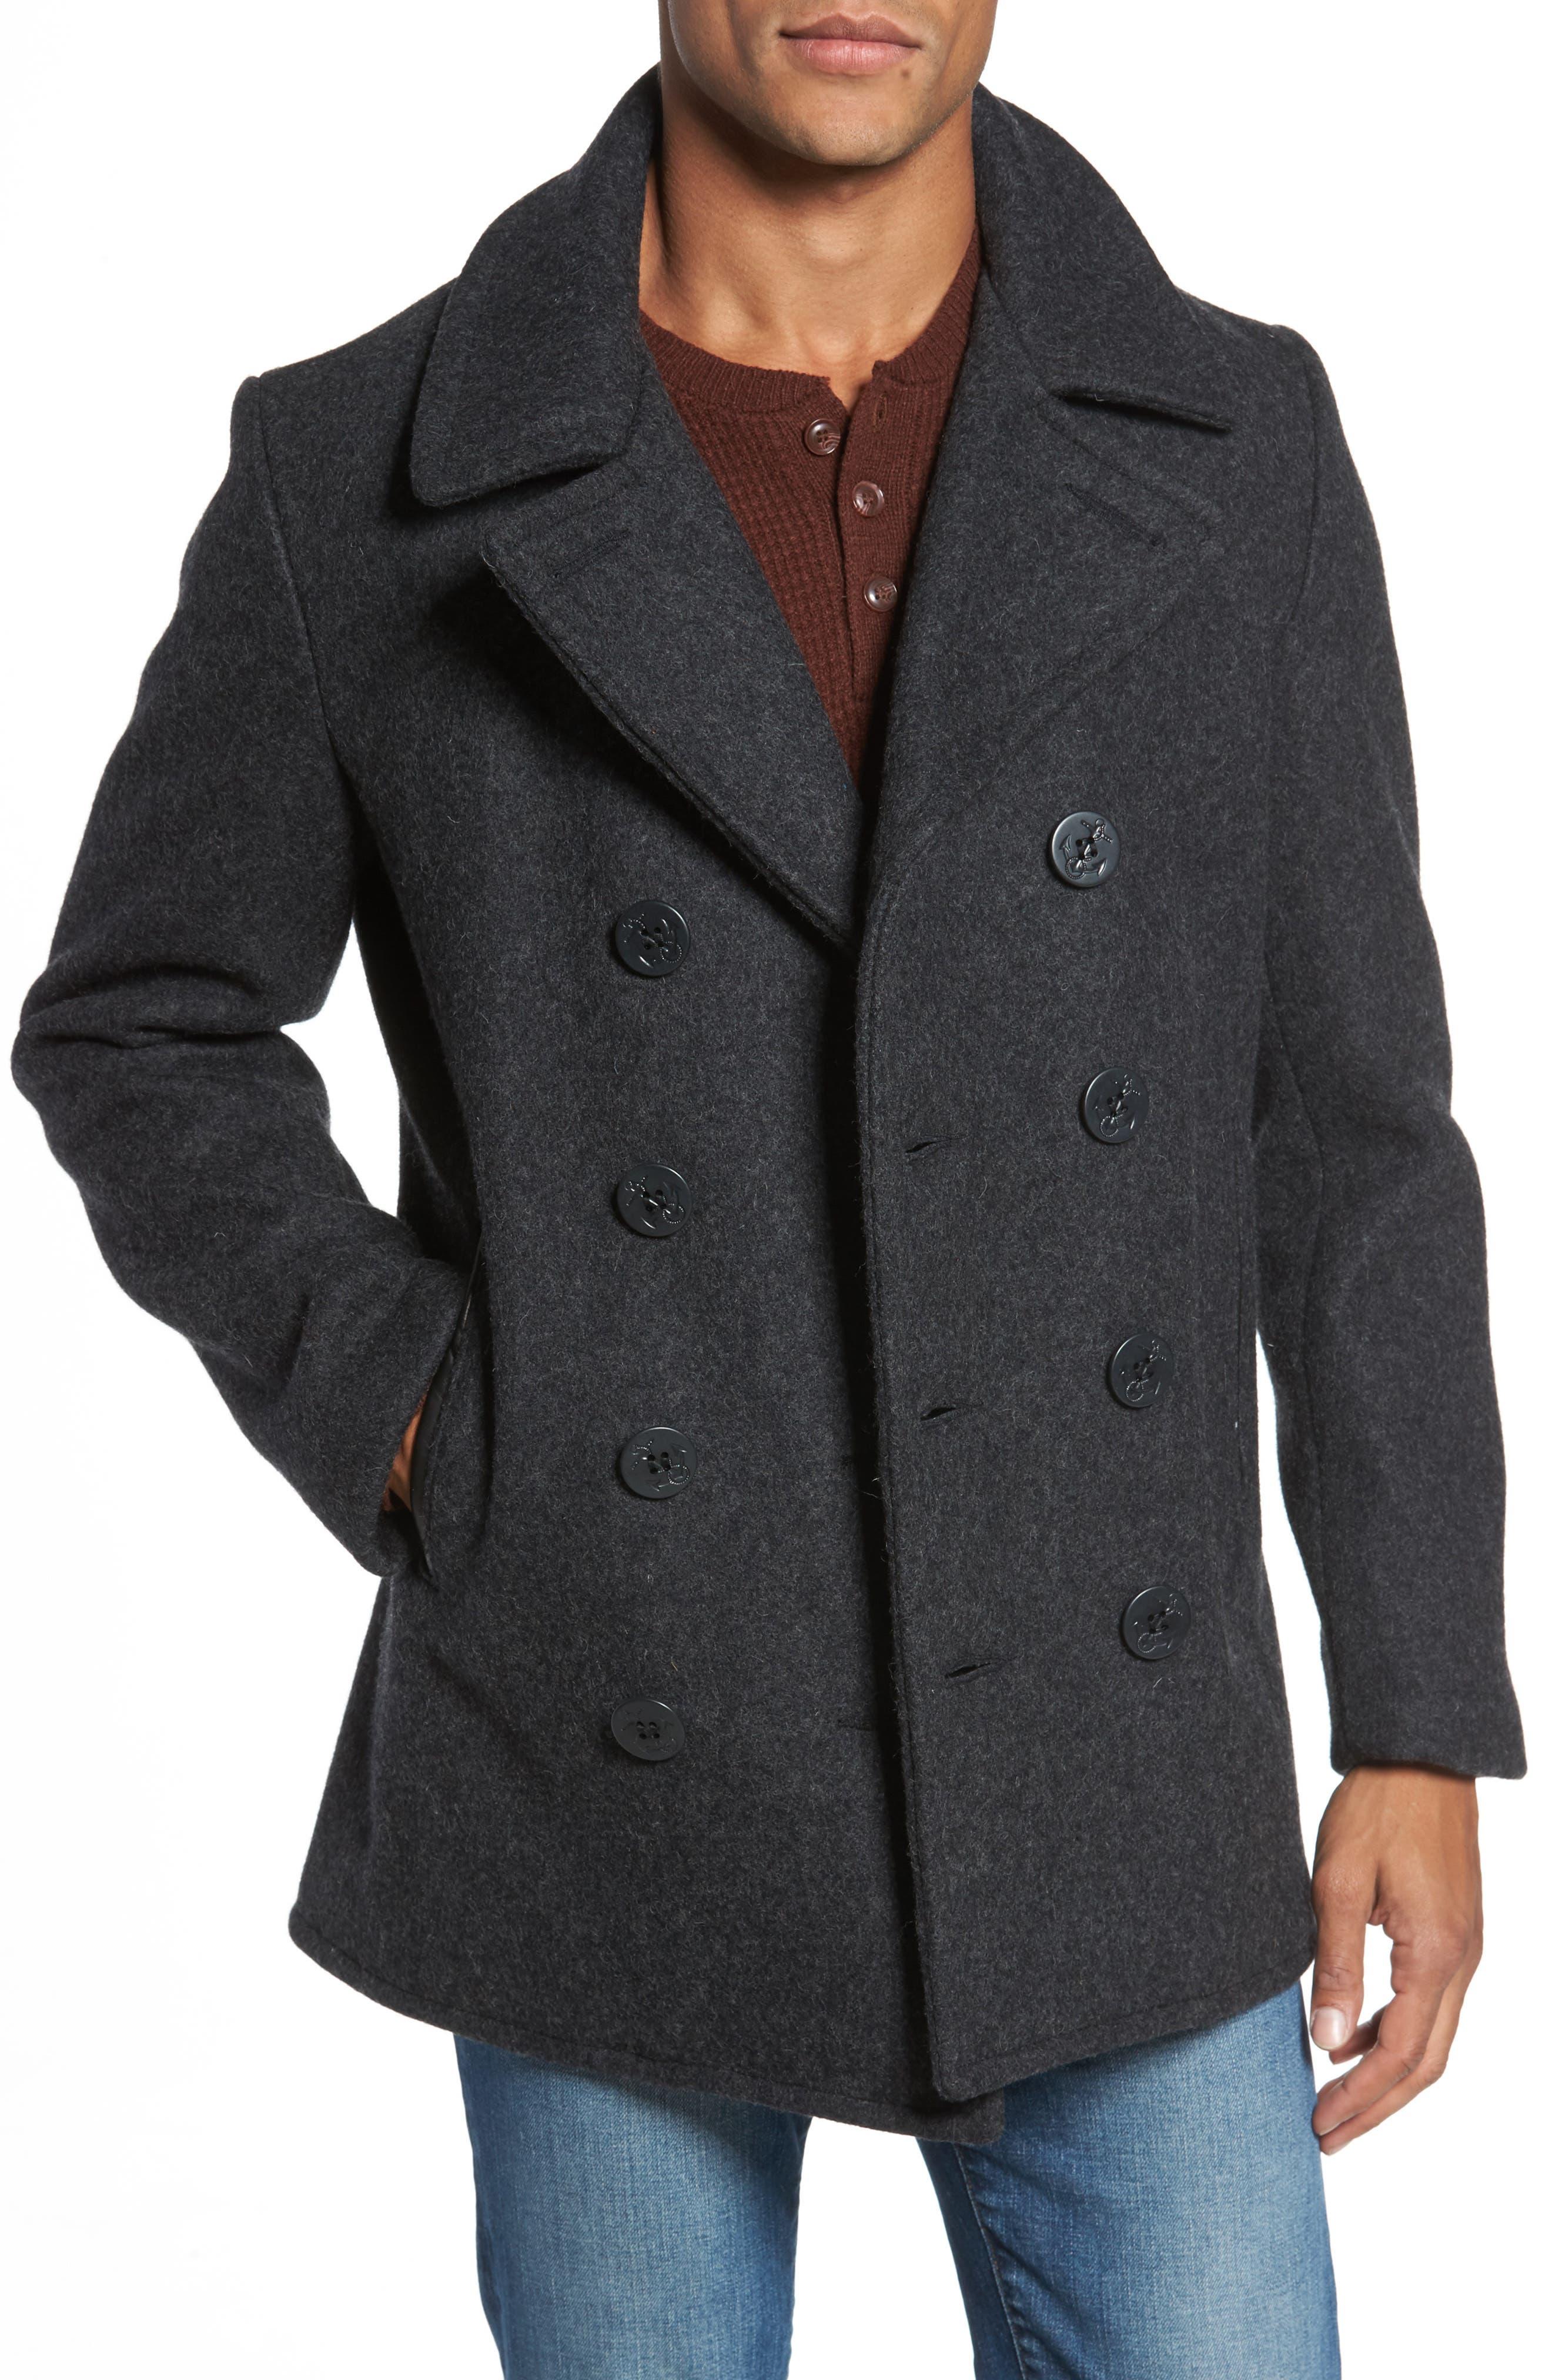 Slim Fit Melton Wool Blend Peacoat,                             Main thumbnail 1, color,                             022